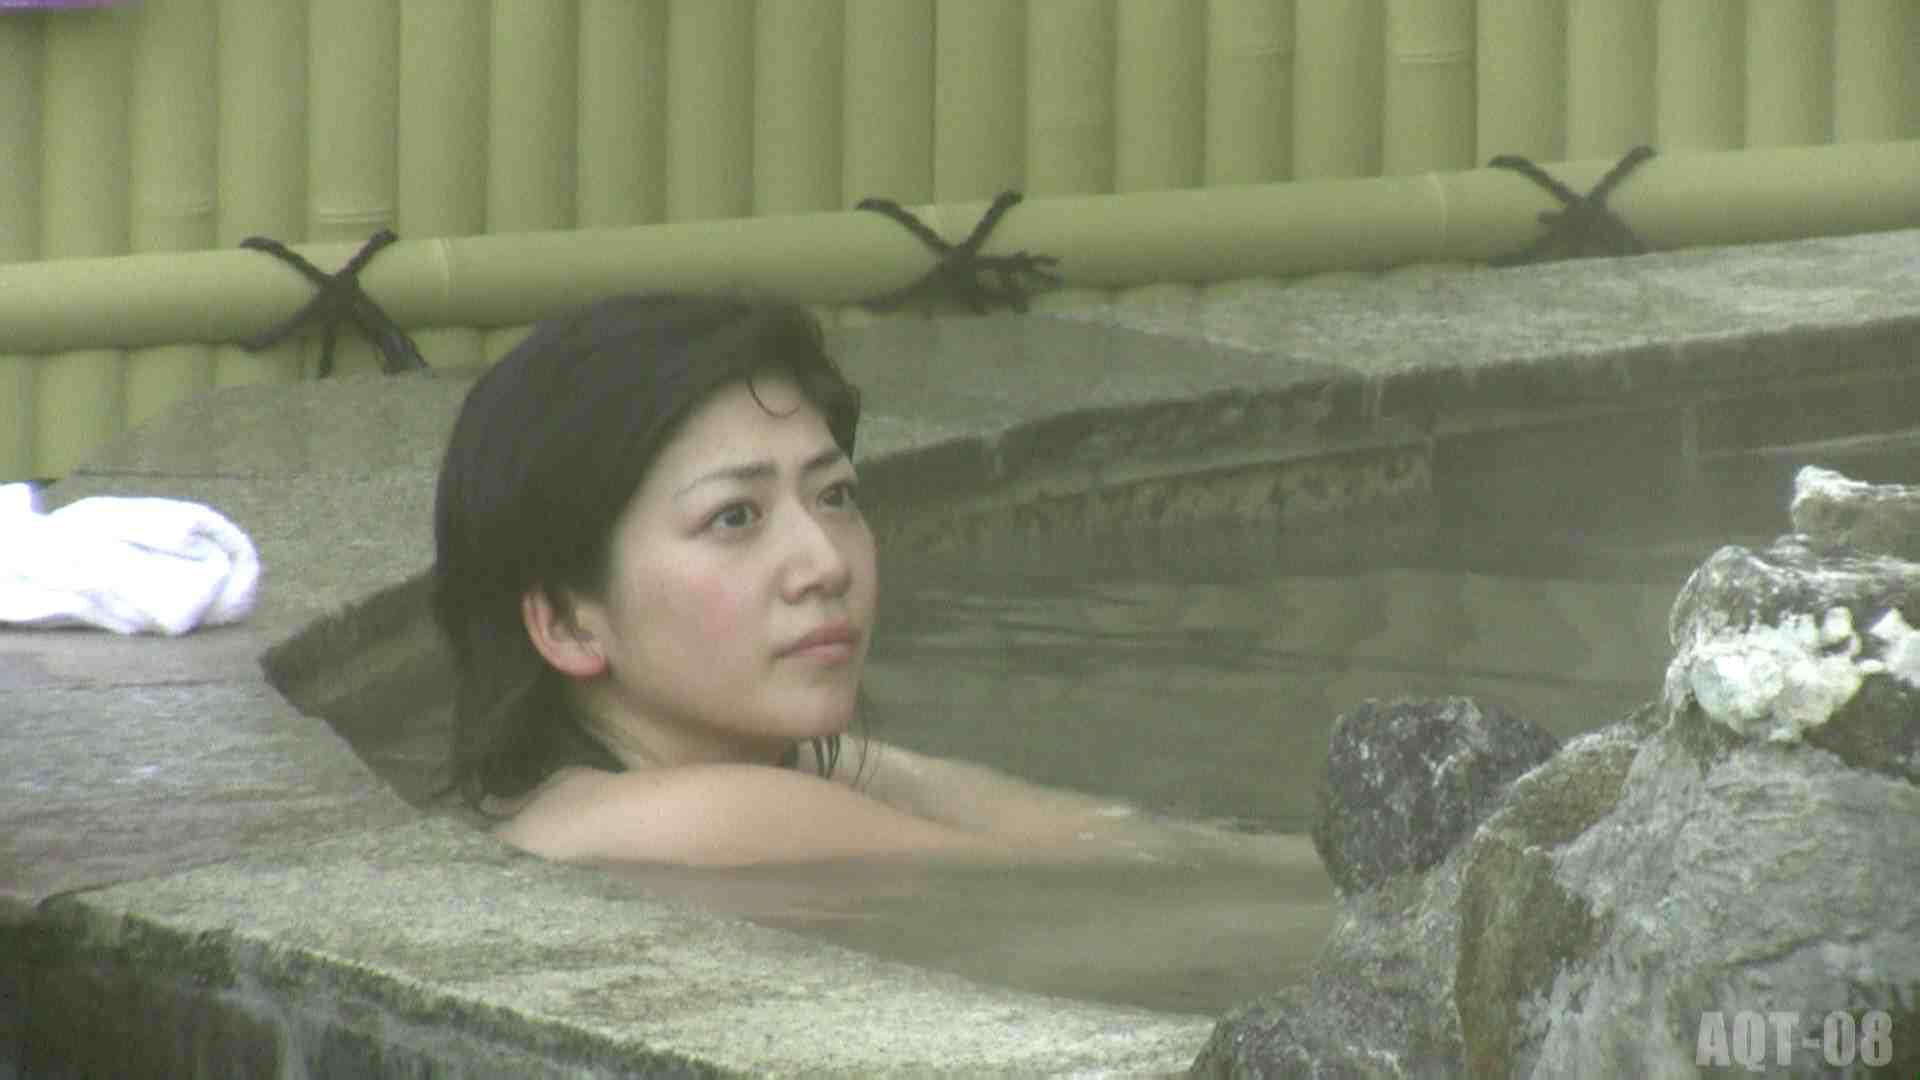 Aquaな露天風呂Vol.776 露天 | OLセックス  108画像 85